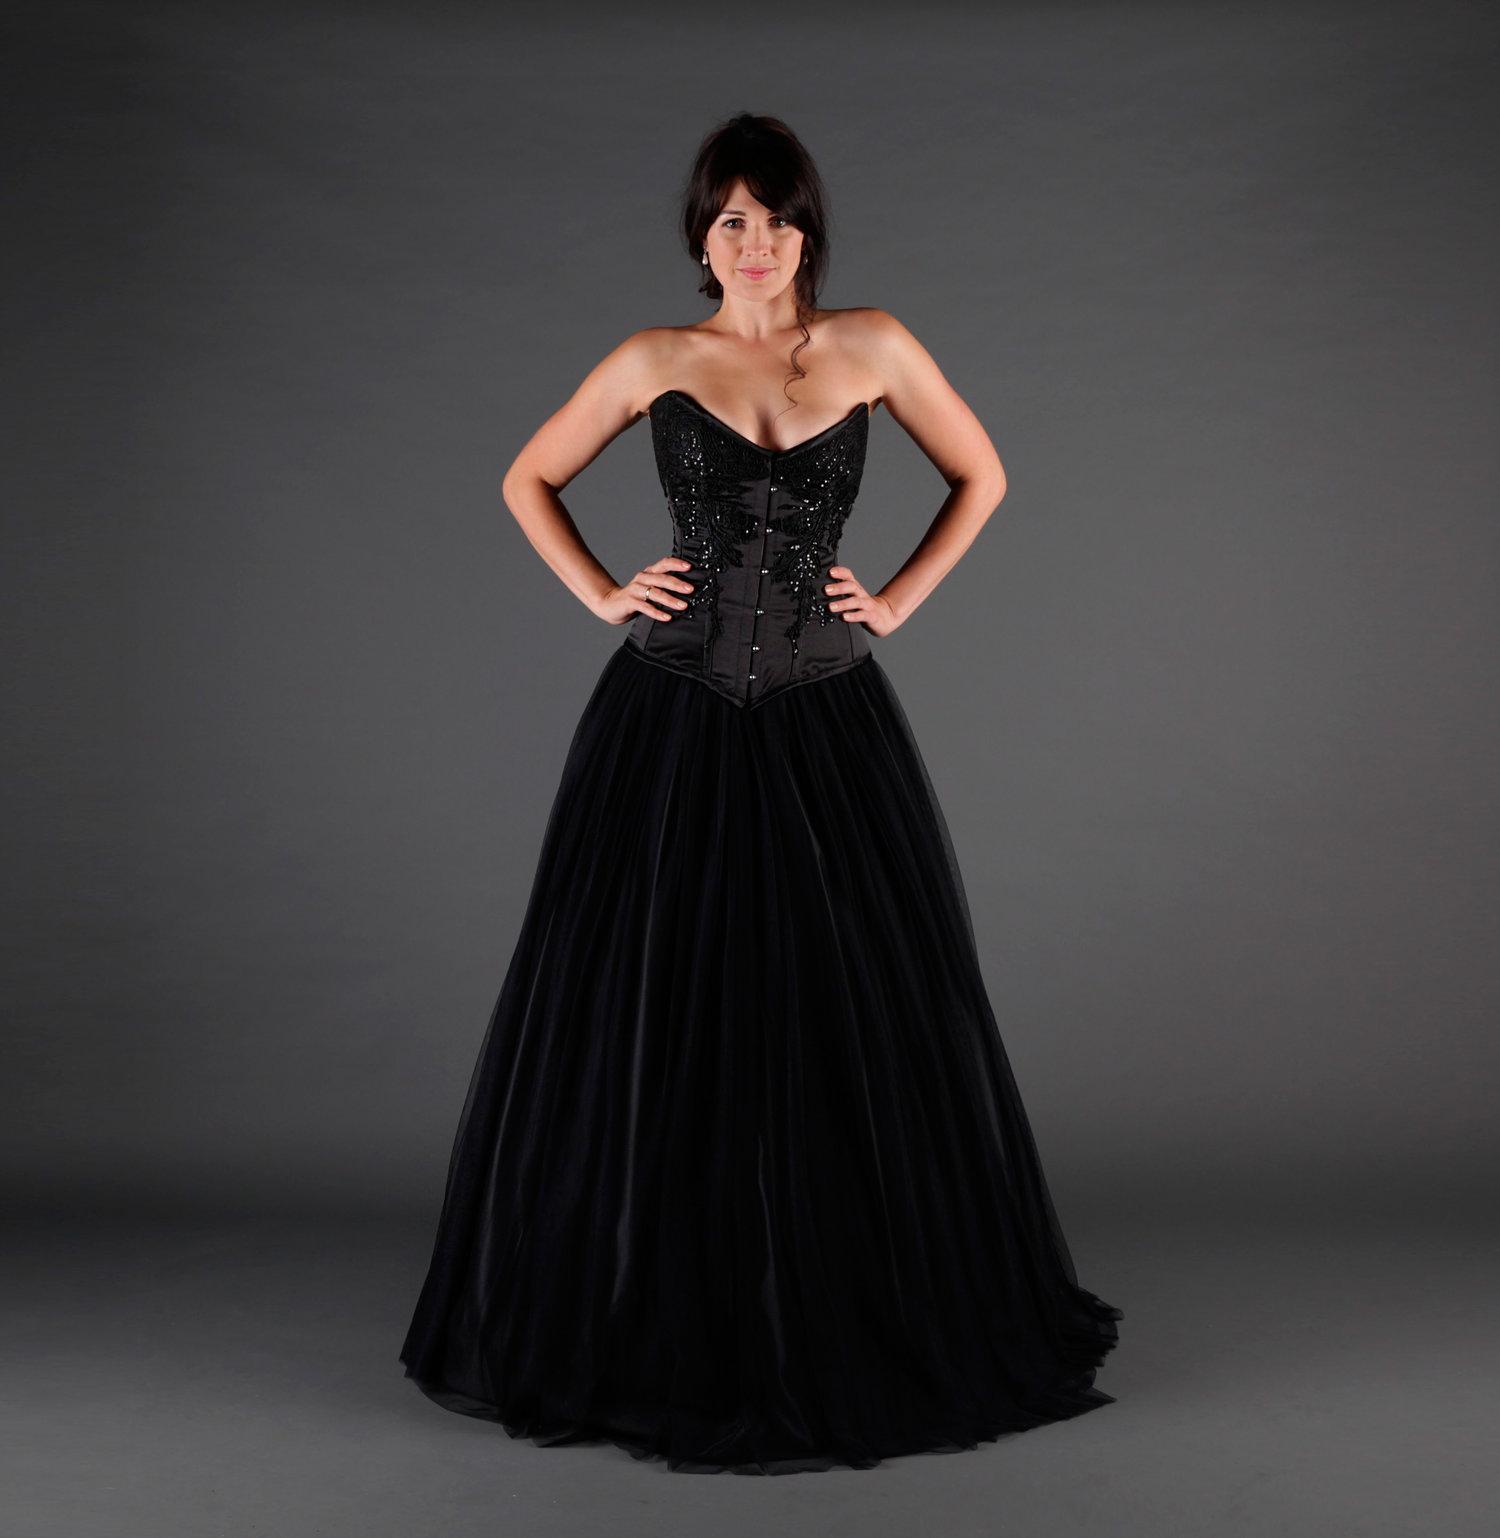 a4f0a19e0f406 QUEEN: Black Wedding Dress — IVORY BLACK